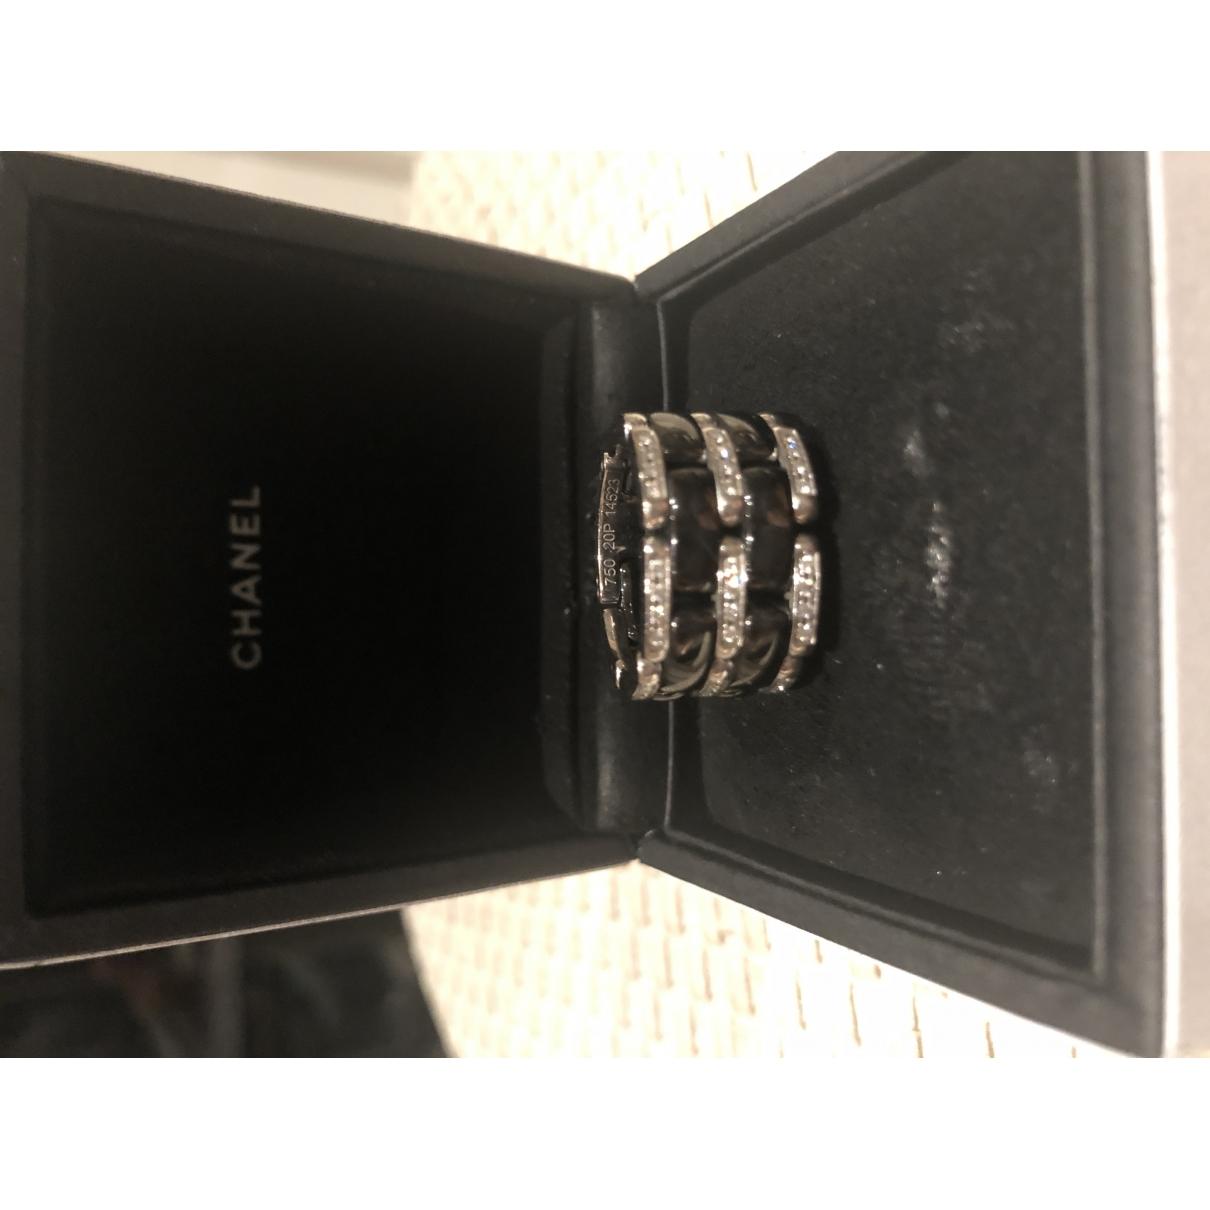 Anillo Ultra de Oro blanco Chanel